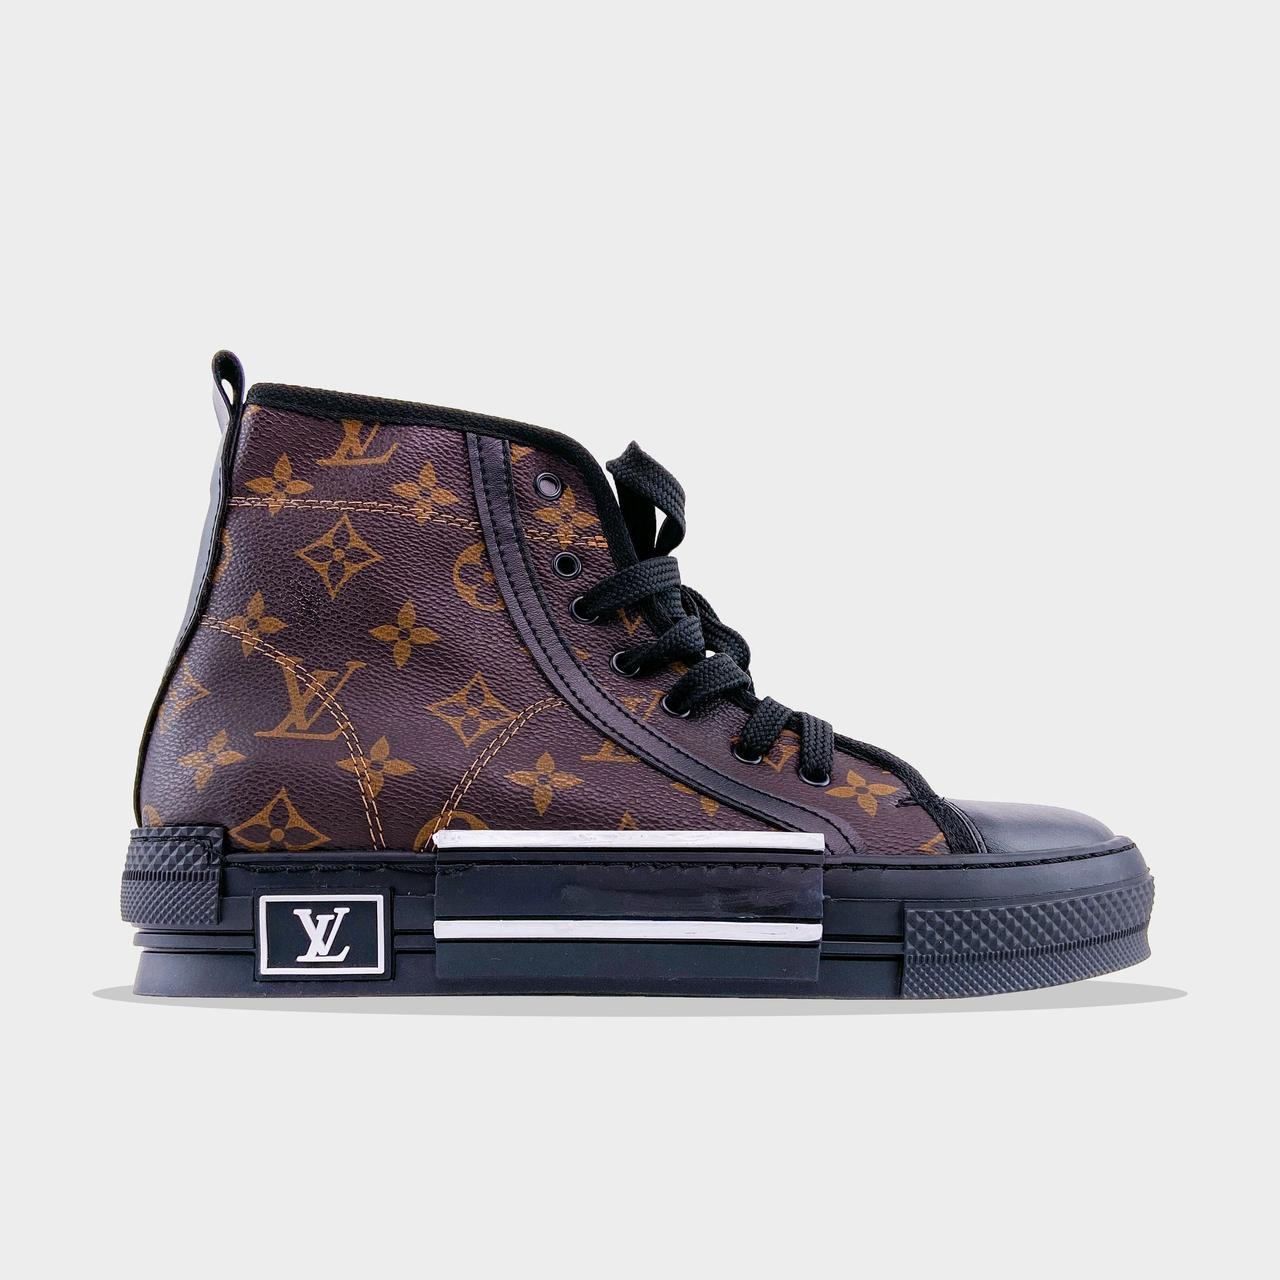 L@uis Vuitt@n кроссовки, крос, обувь, взуття, sneakers, шузы, B23 Brown Black (Коричневый)